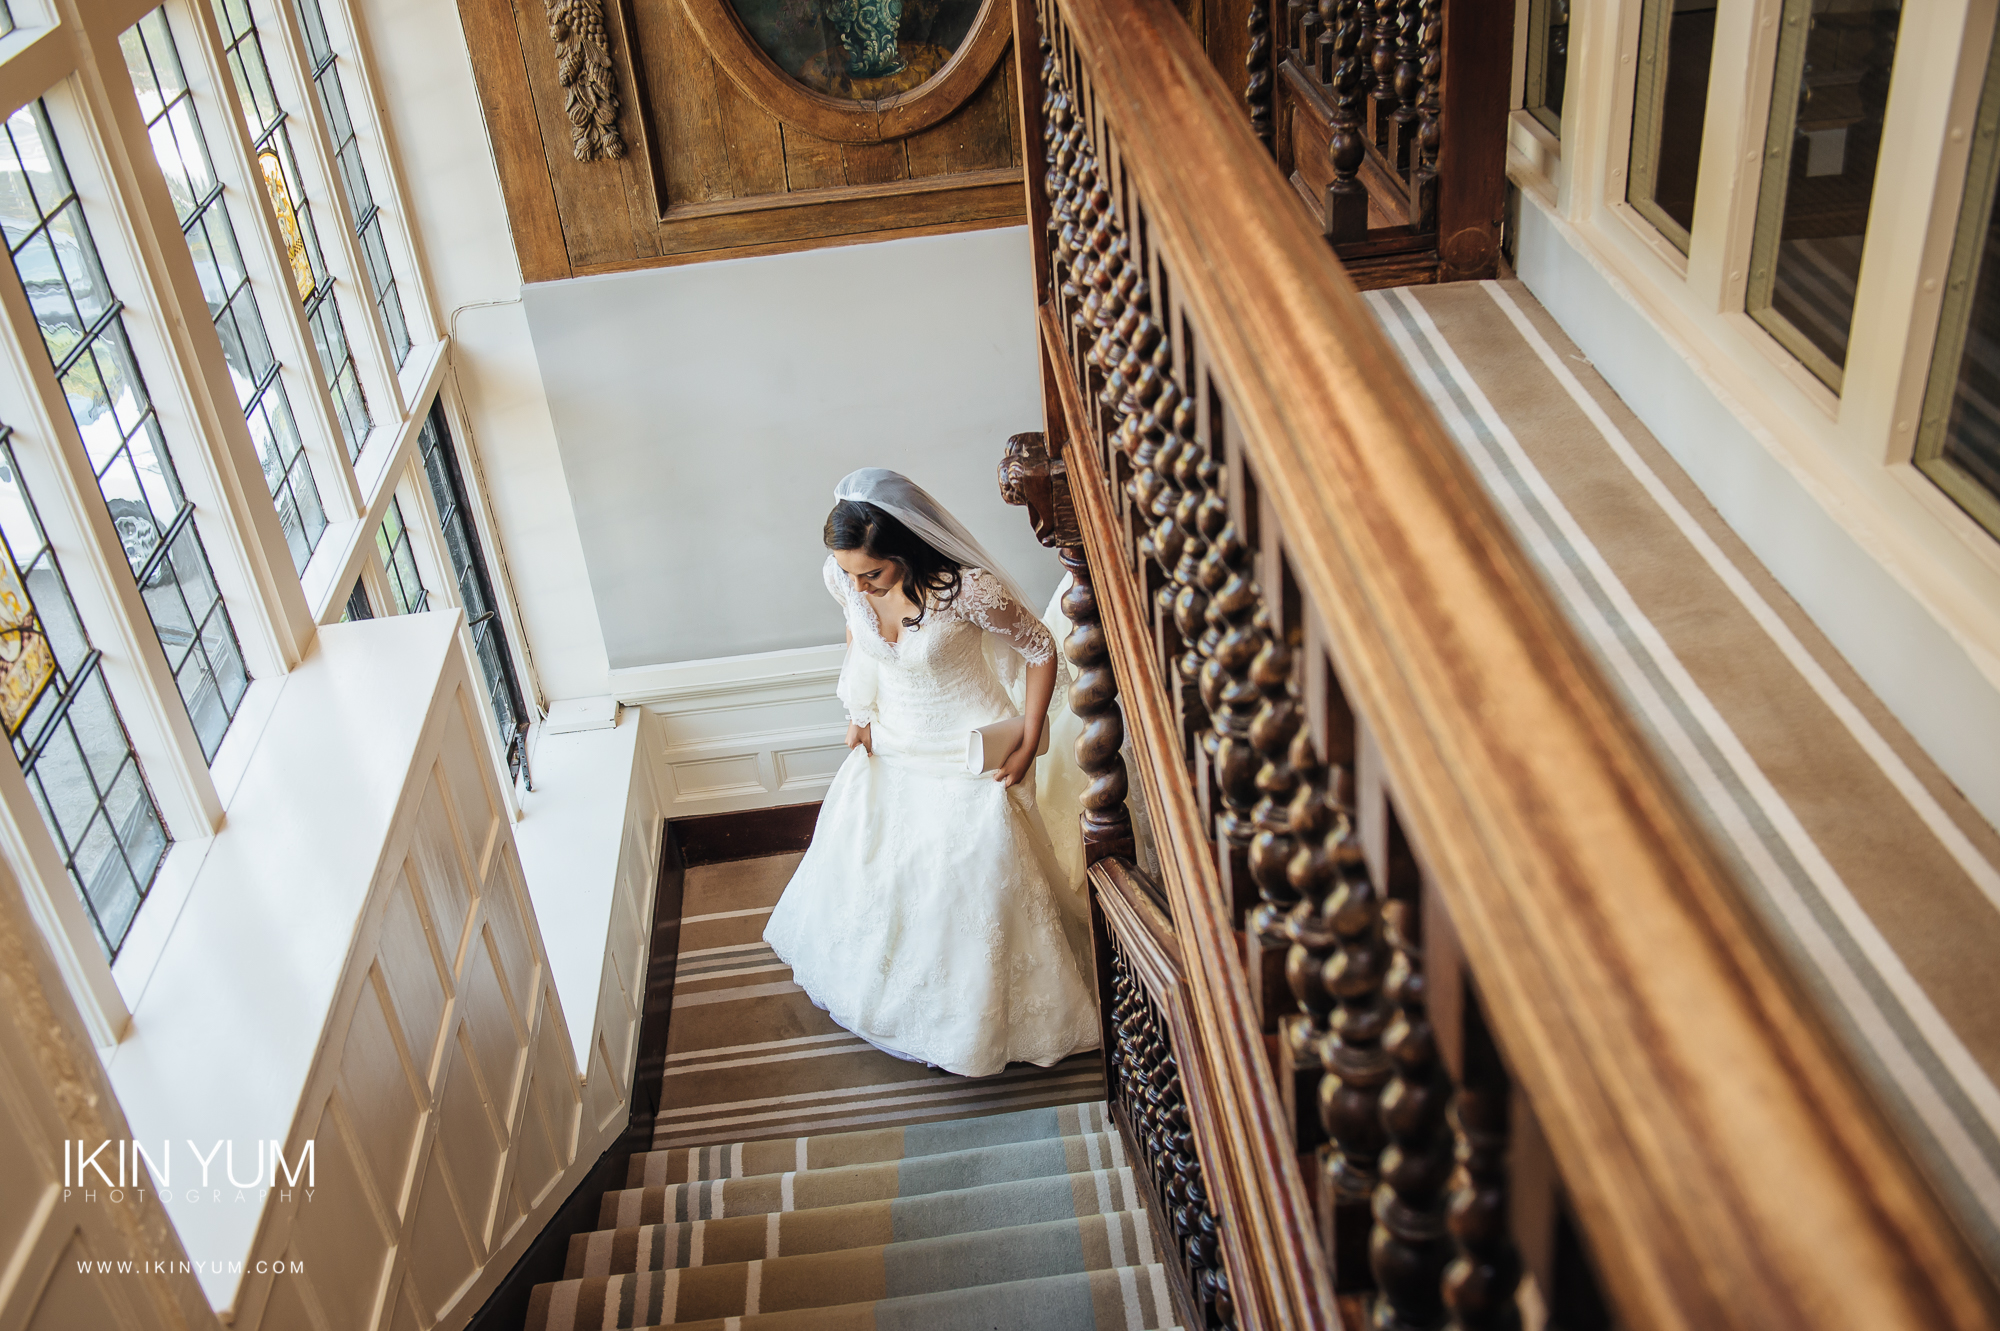 Laura Ashley Manor Wedding - Ikin Yum Photography-018.jpg